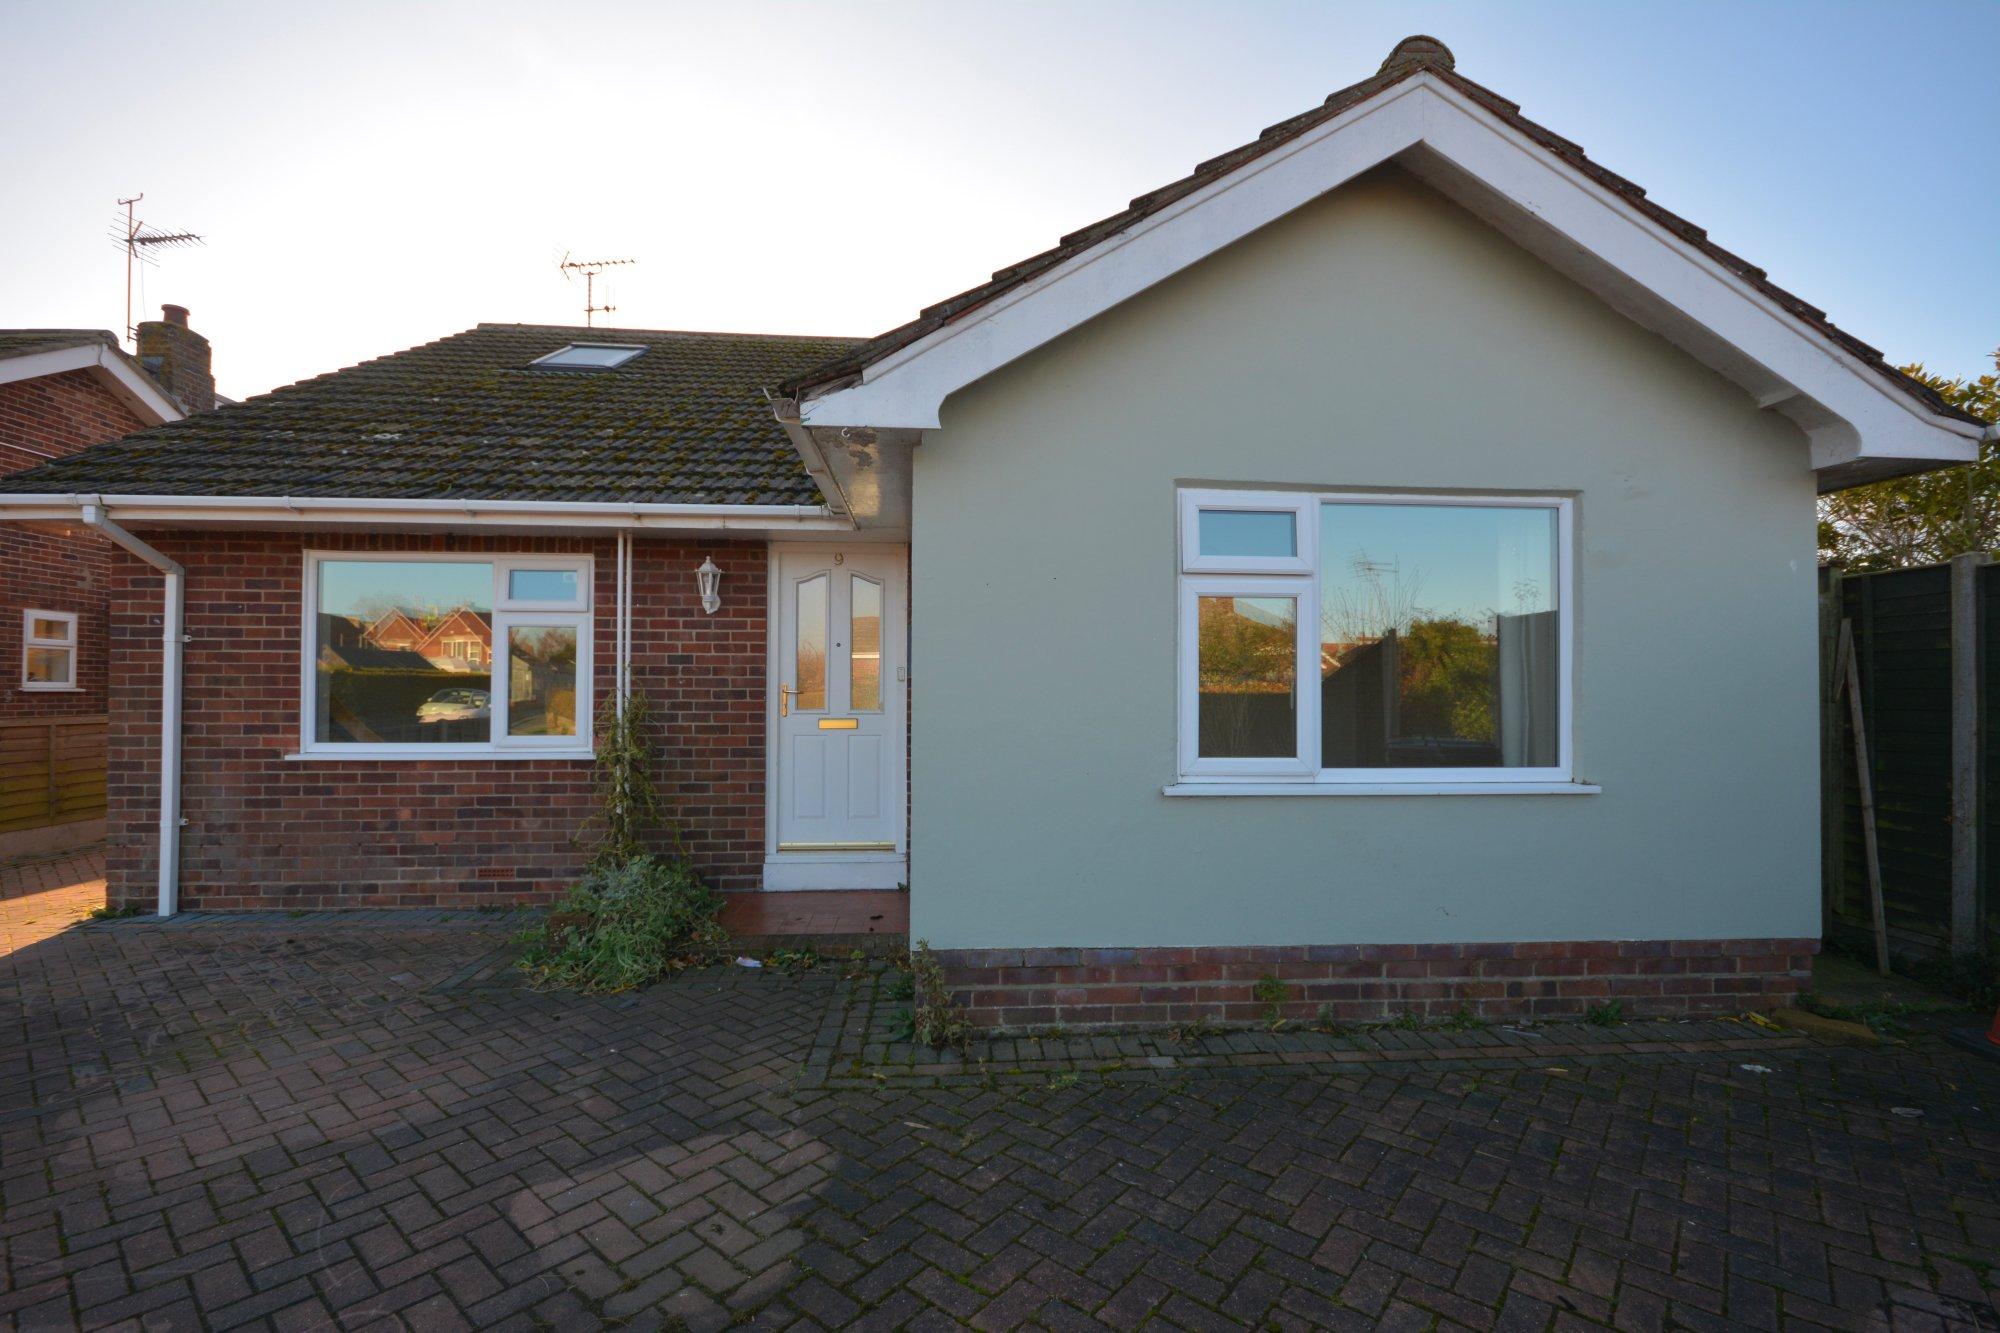 Bedroom Properties For Sale In Lowestoft